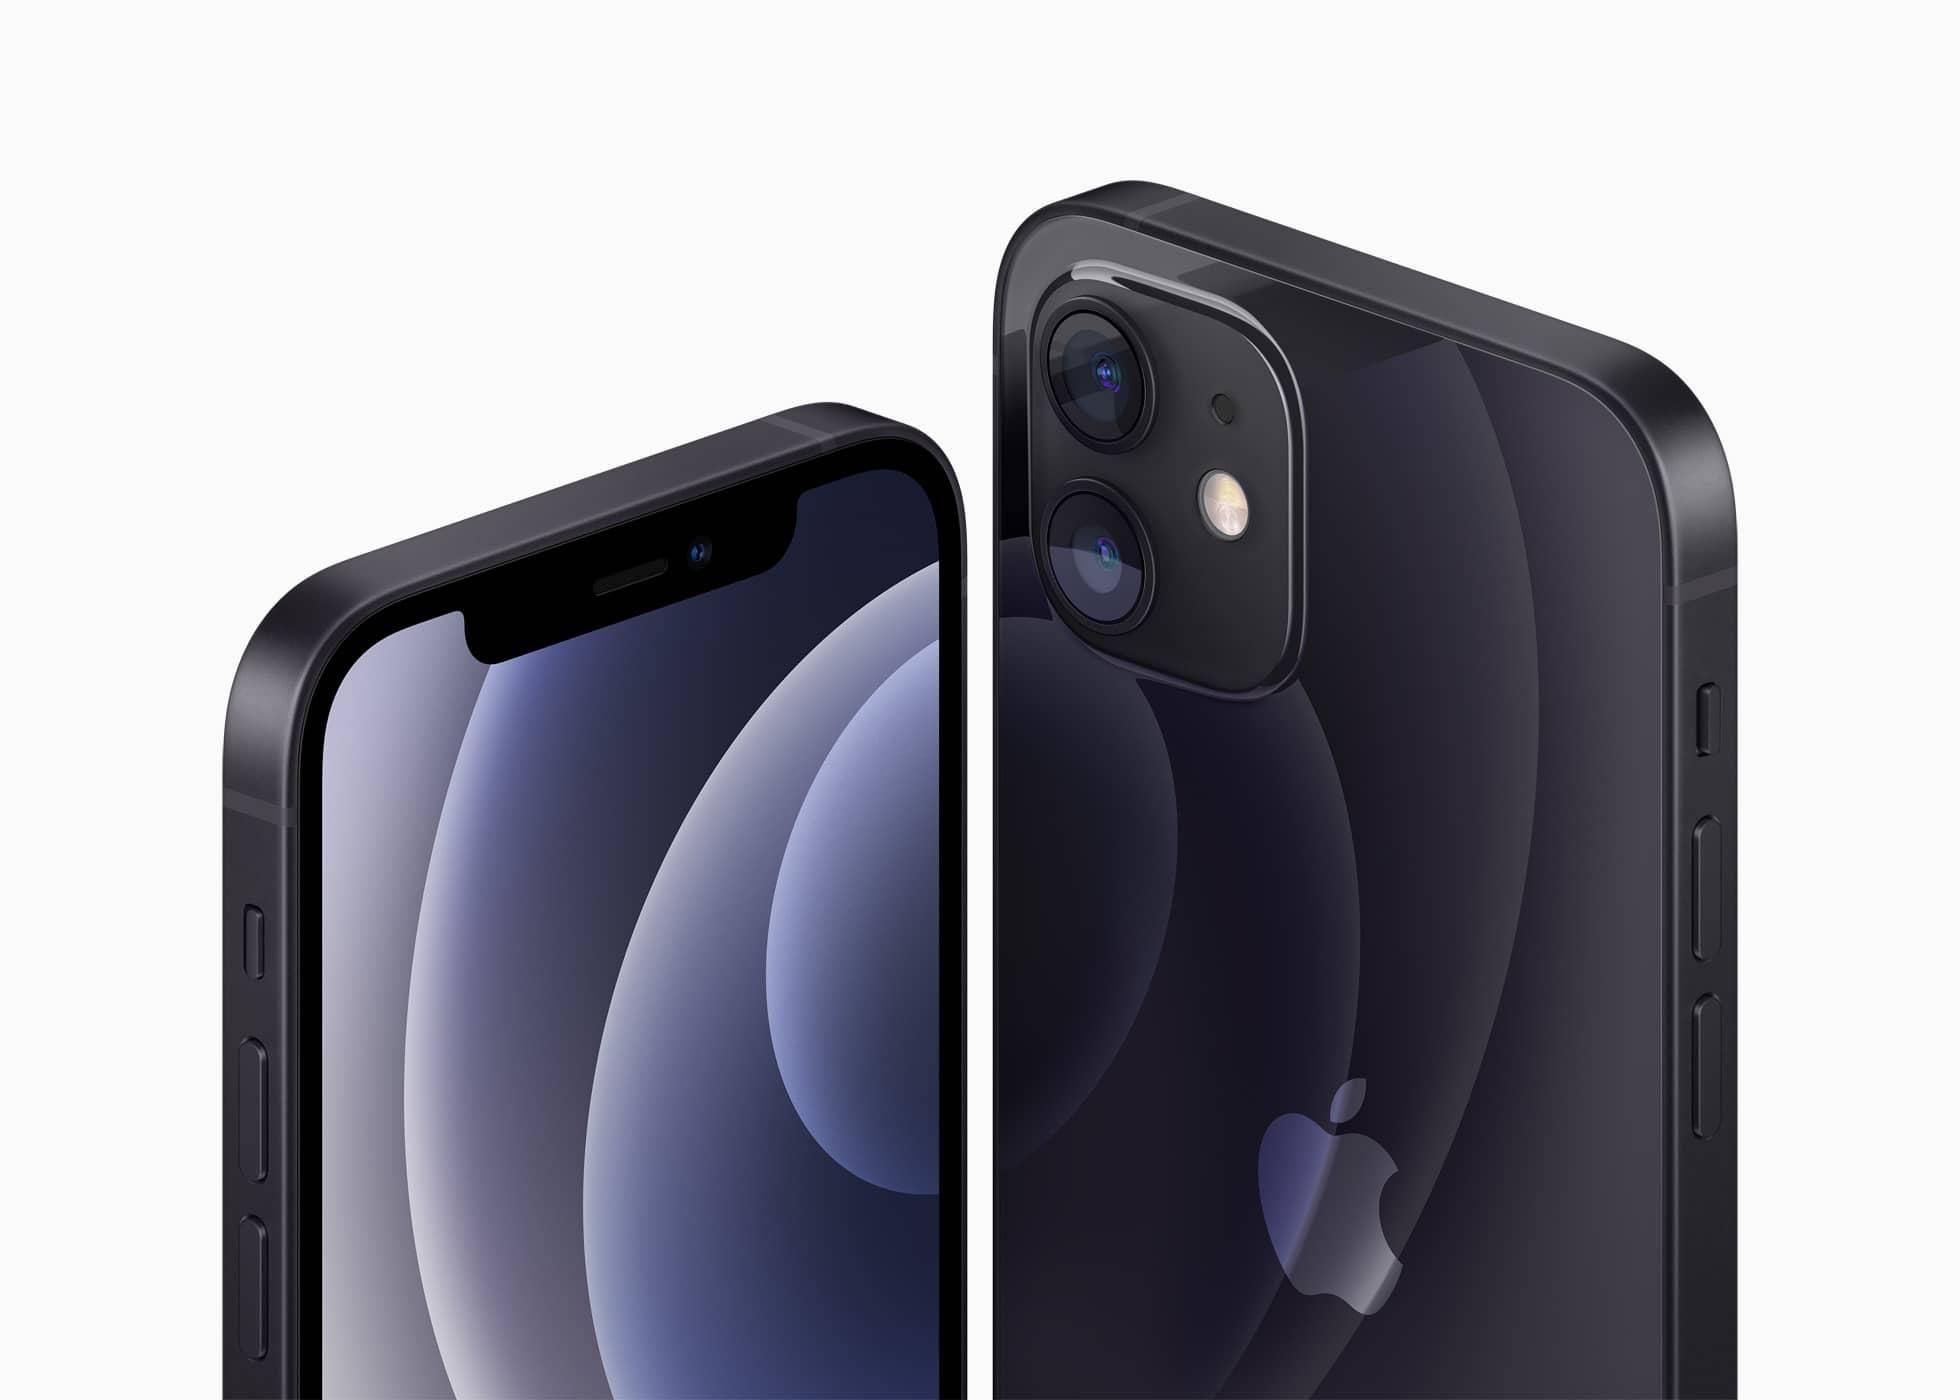 apple iphone 12 color black 10132020